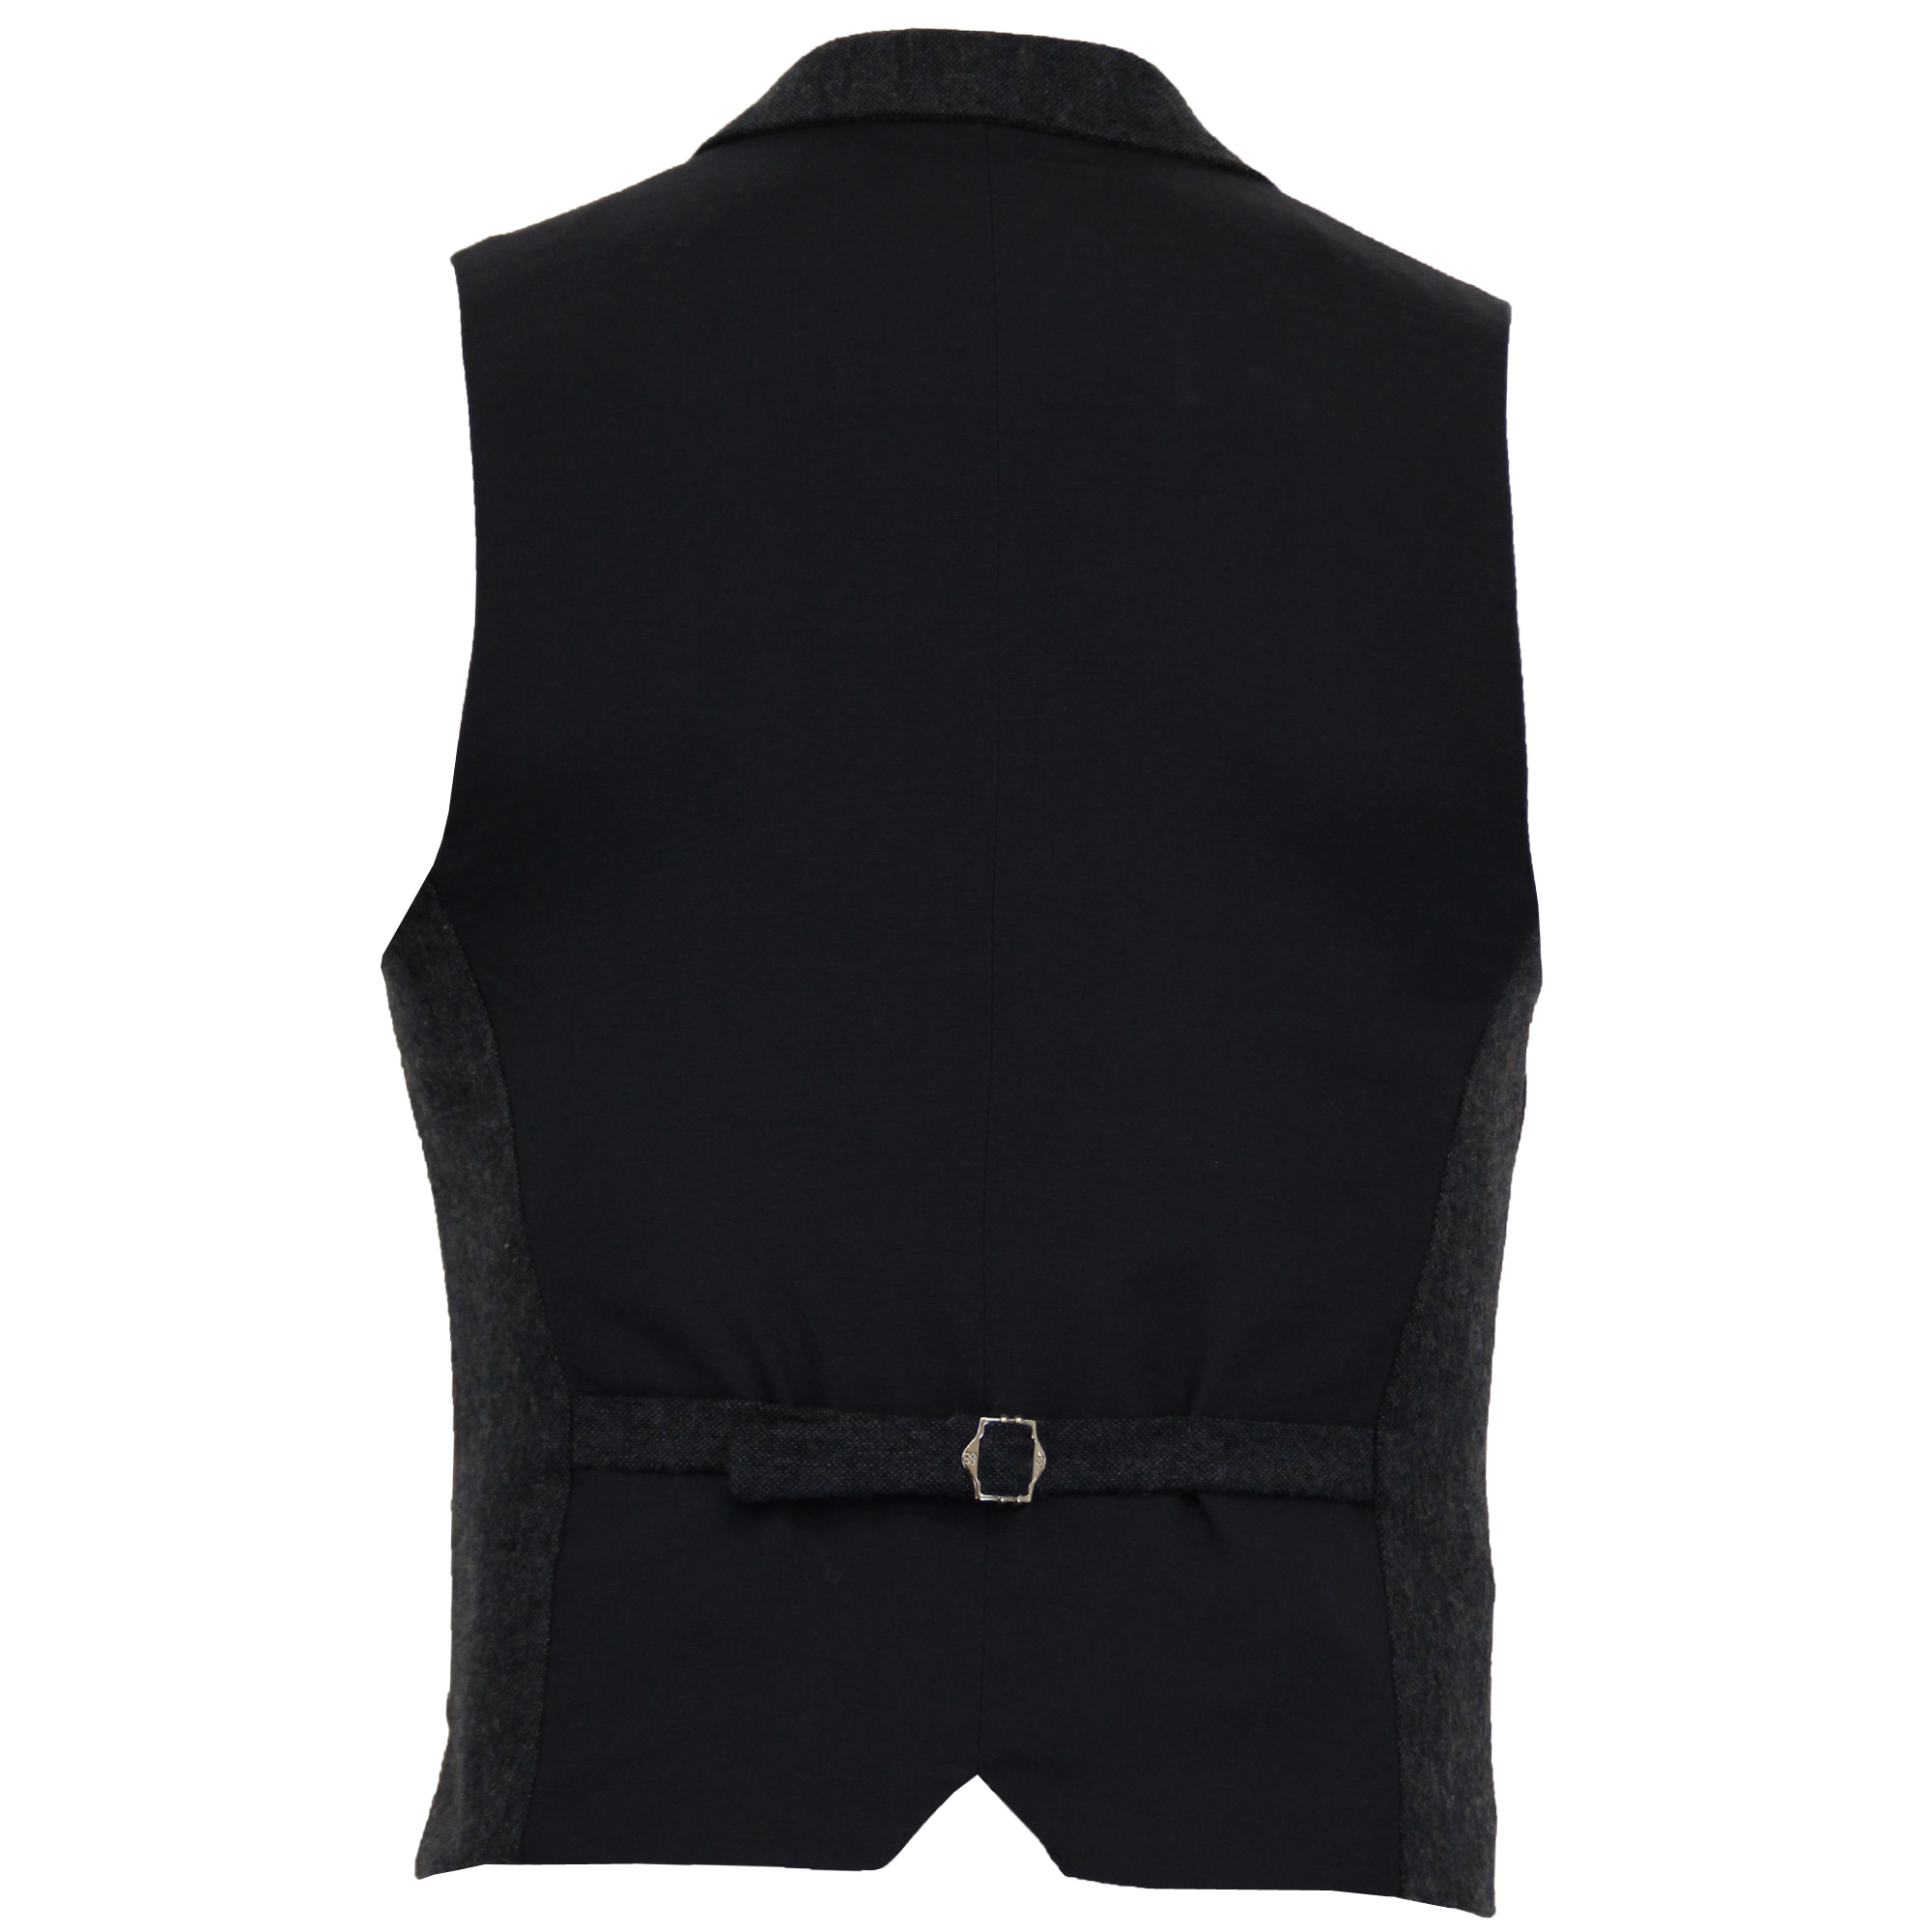 Mens-Waistcoat-Wool-Mix-Cavani-Formal-Vest-Herringbone-Tweed-Check-Party-Smart thumbnail 28